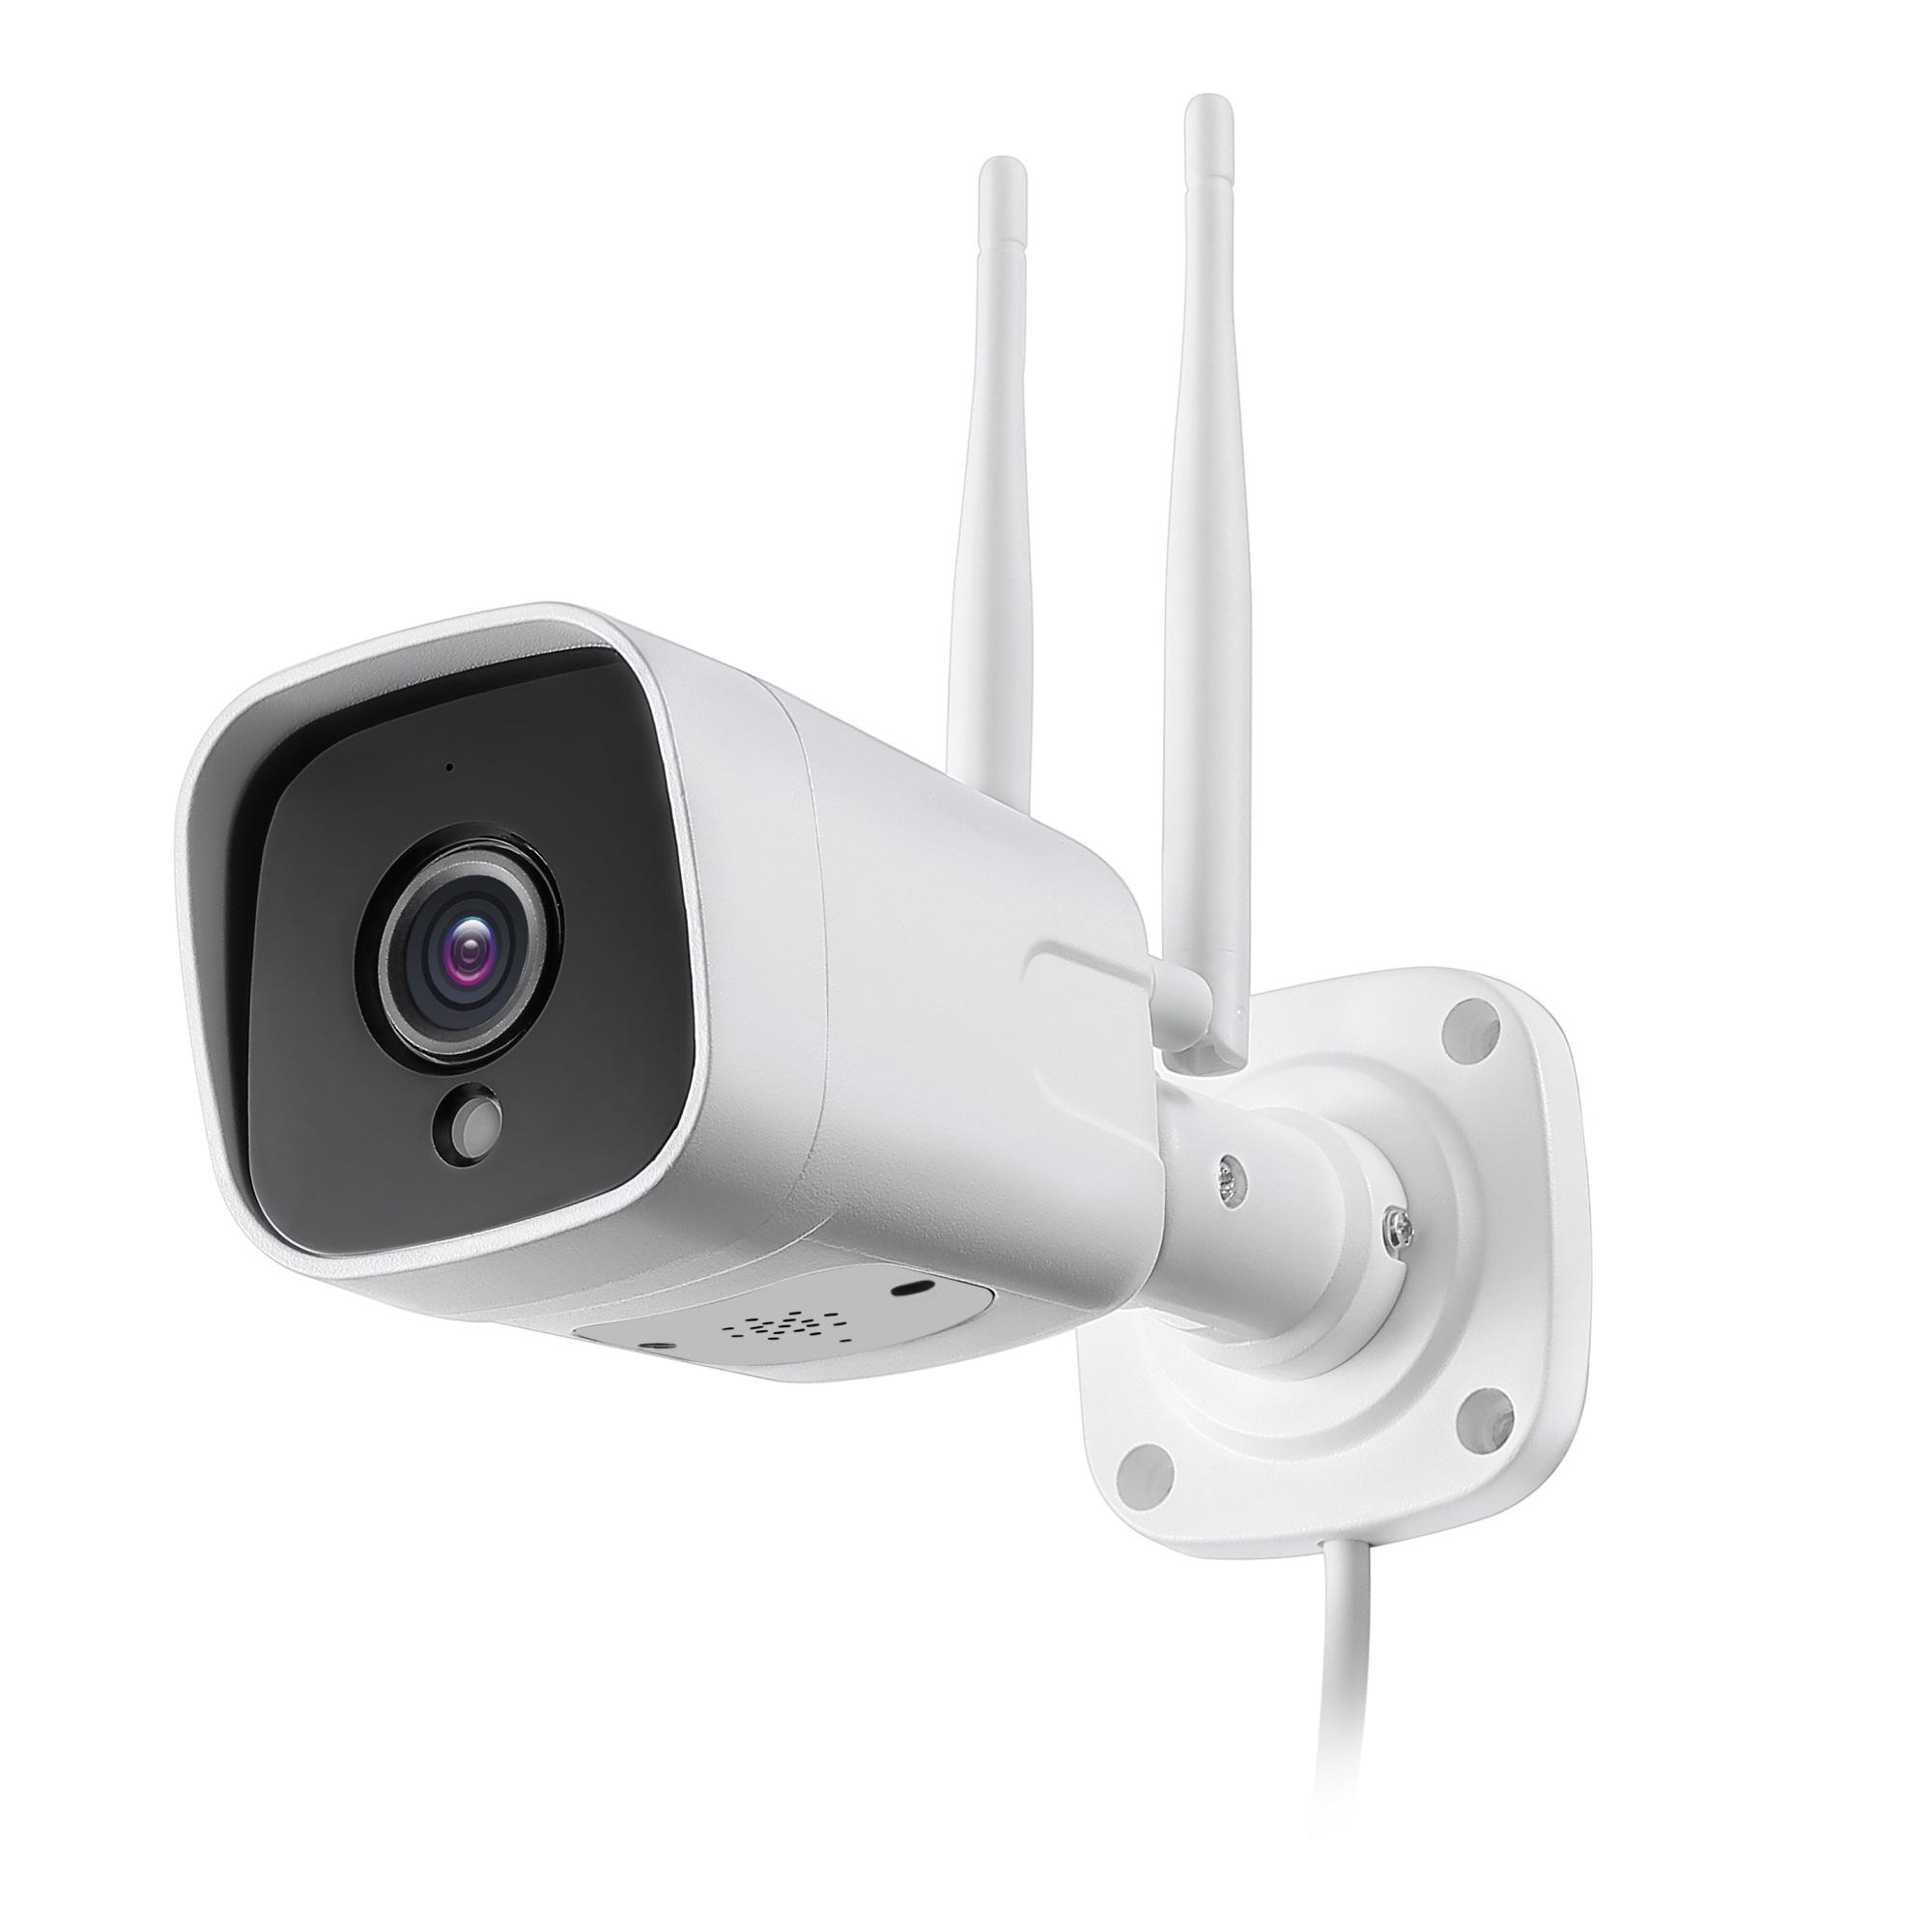 3G 4G Sim Card Outdoor 5MP Bullet Camera, 100m IR, 2 Way Audio